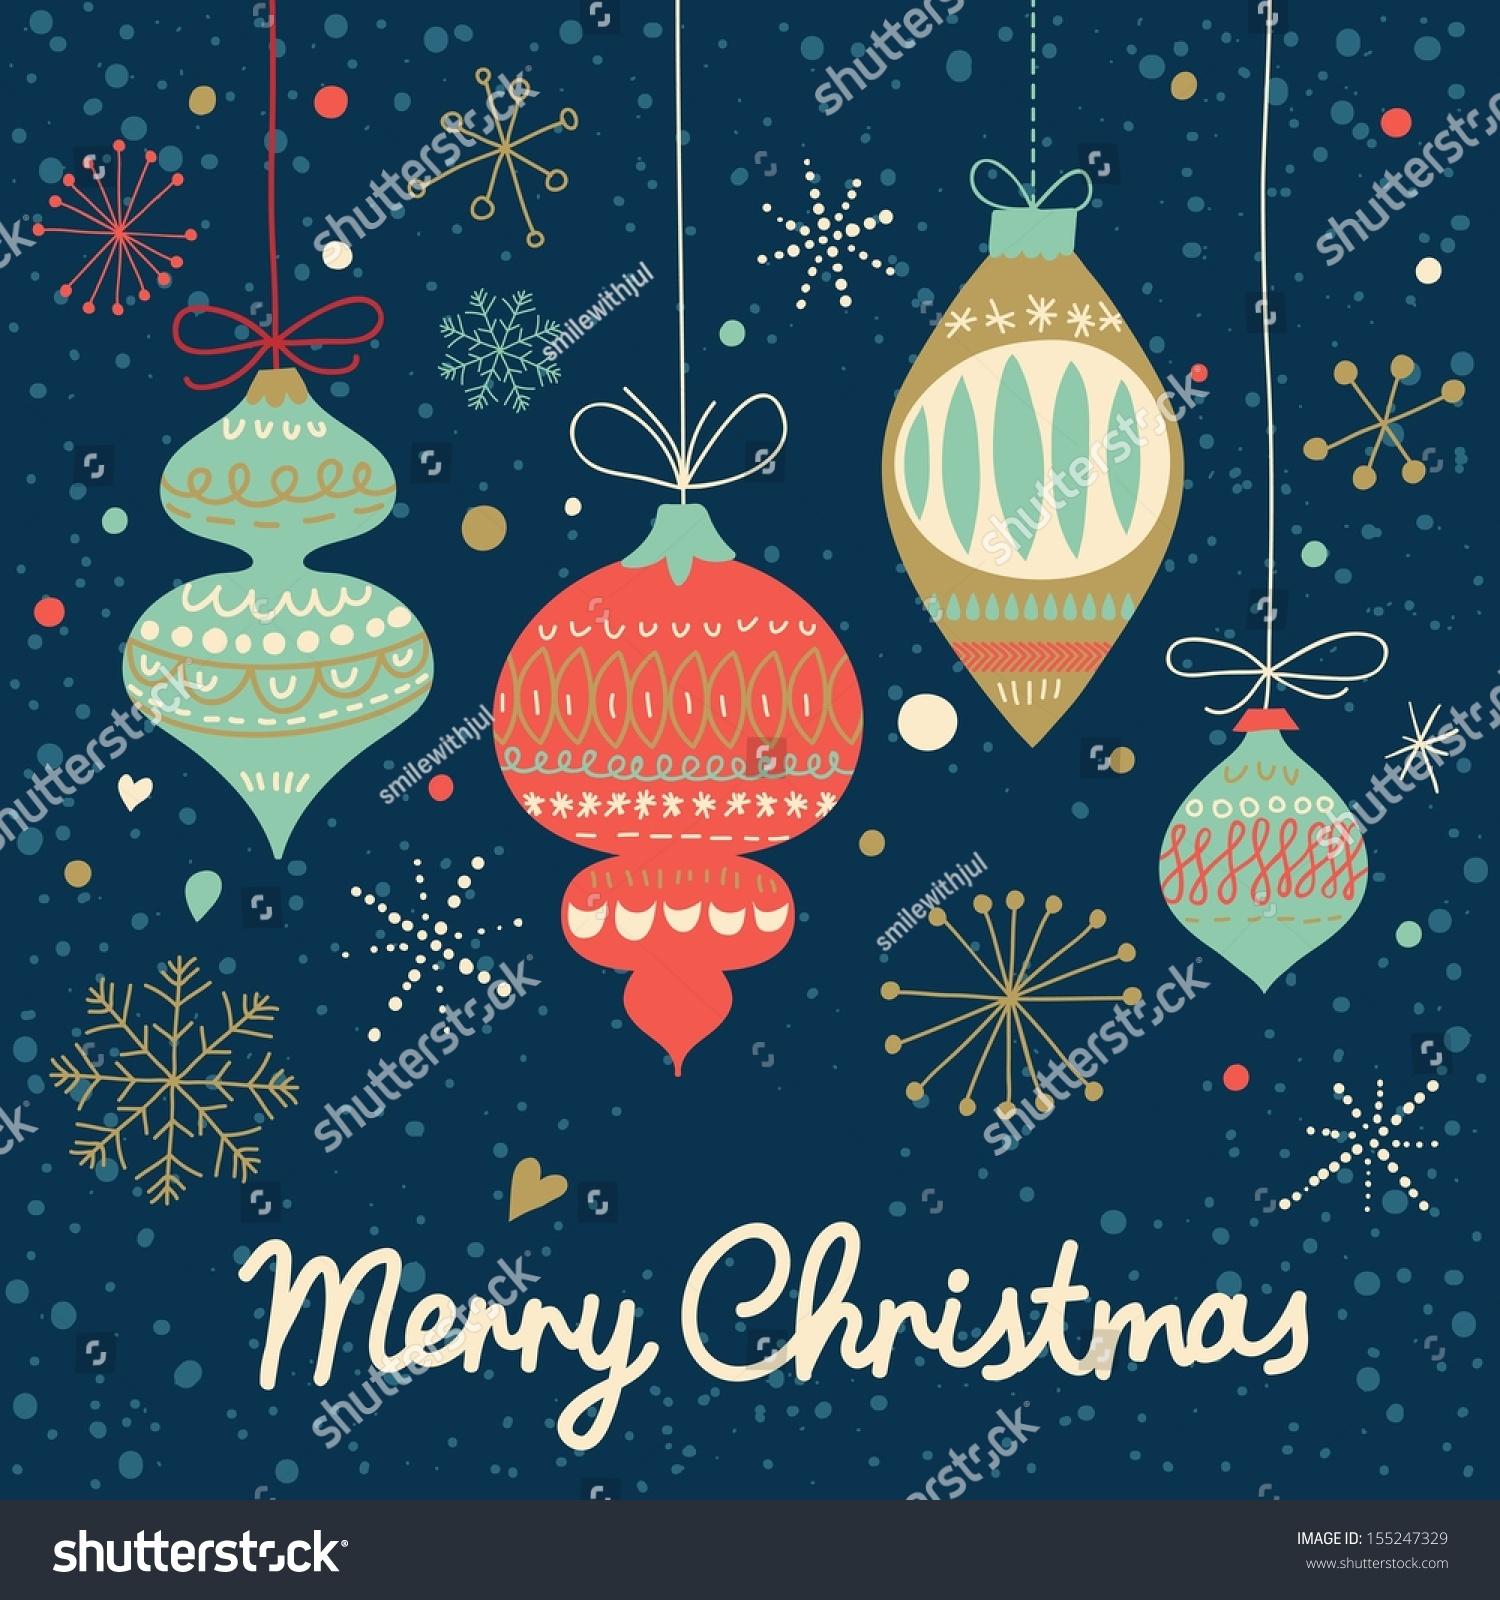 Vintage Merry Christmas Card Vector Stylish Stock Vector